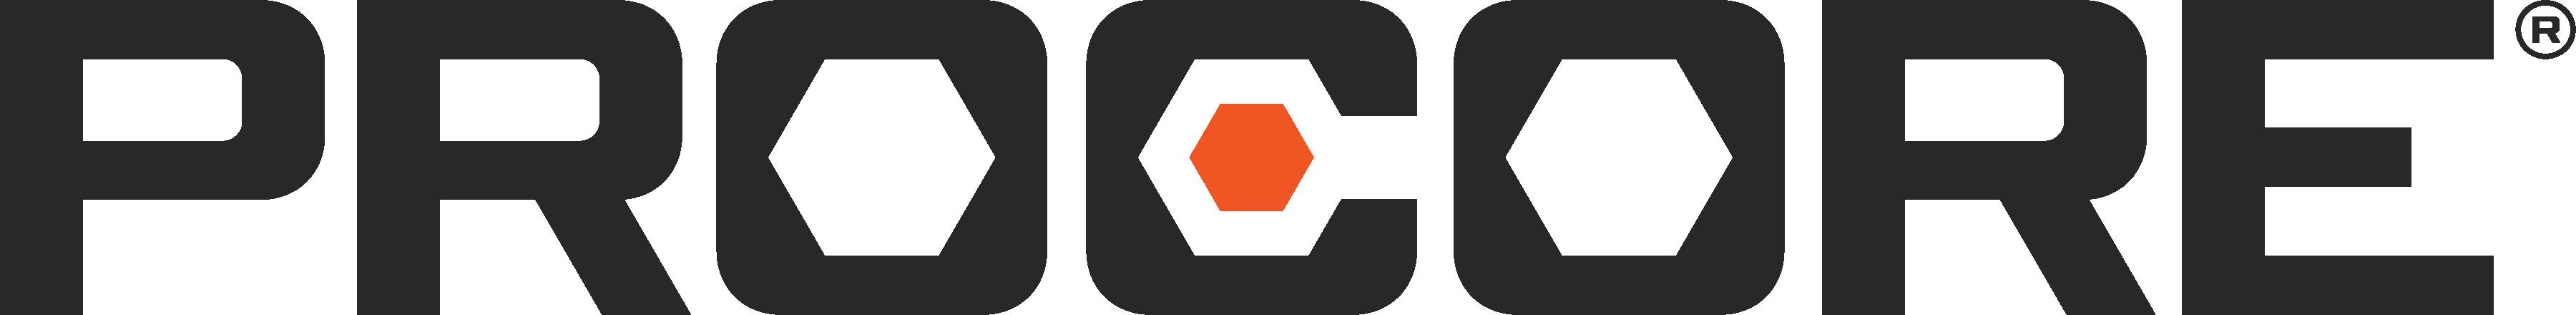 Procore_Logo_FC_Black_CMYK-1-1